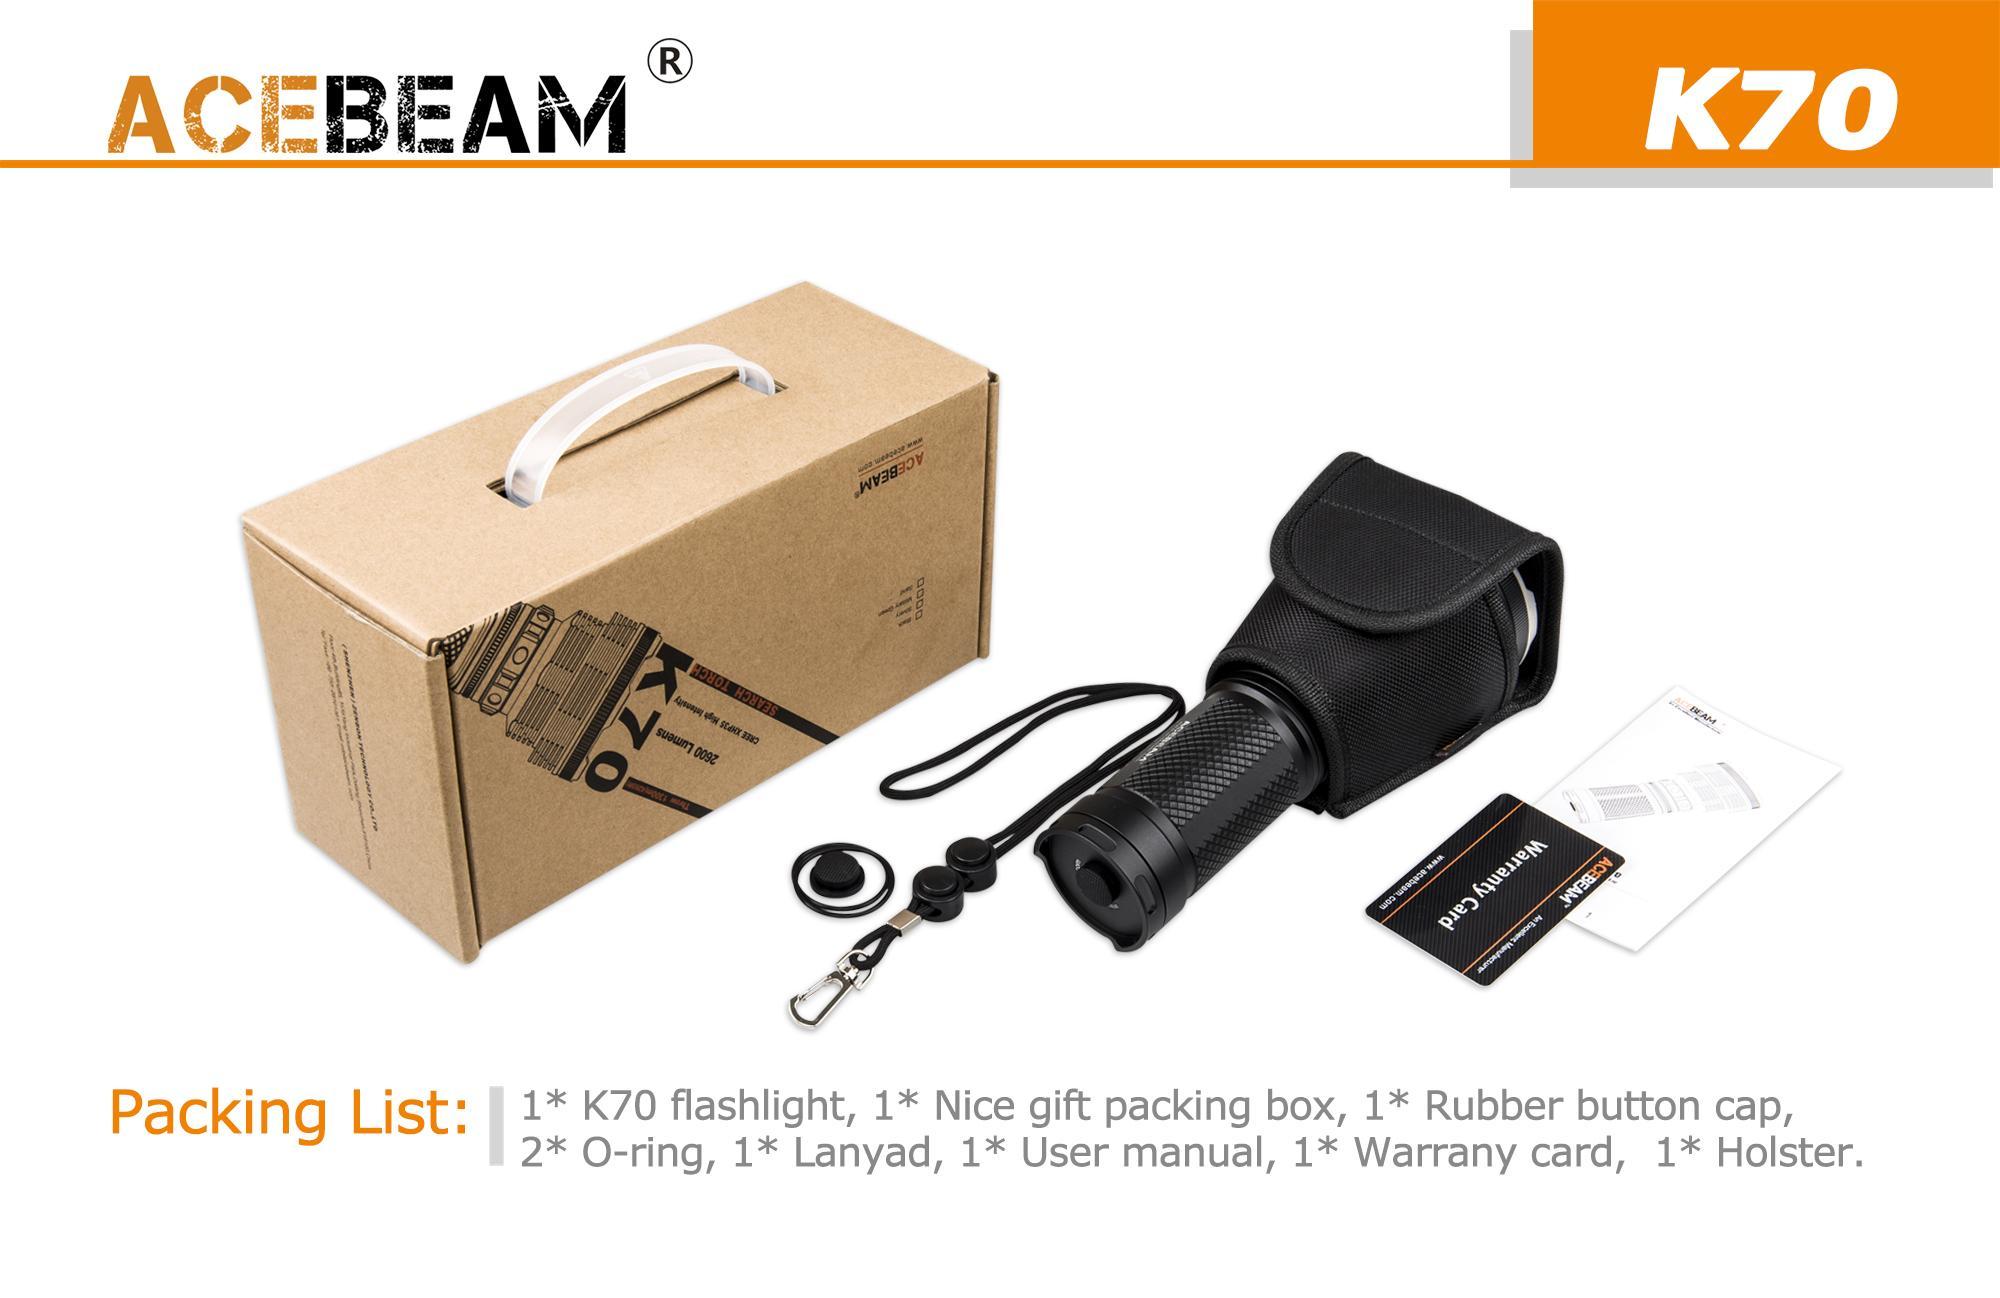 acebeam k70 flashlightcree hi led2600 lumens 1300m beam distance rh andrew amanda com Trailer Wiring Harness Engine Wiring Harness